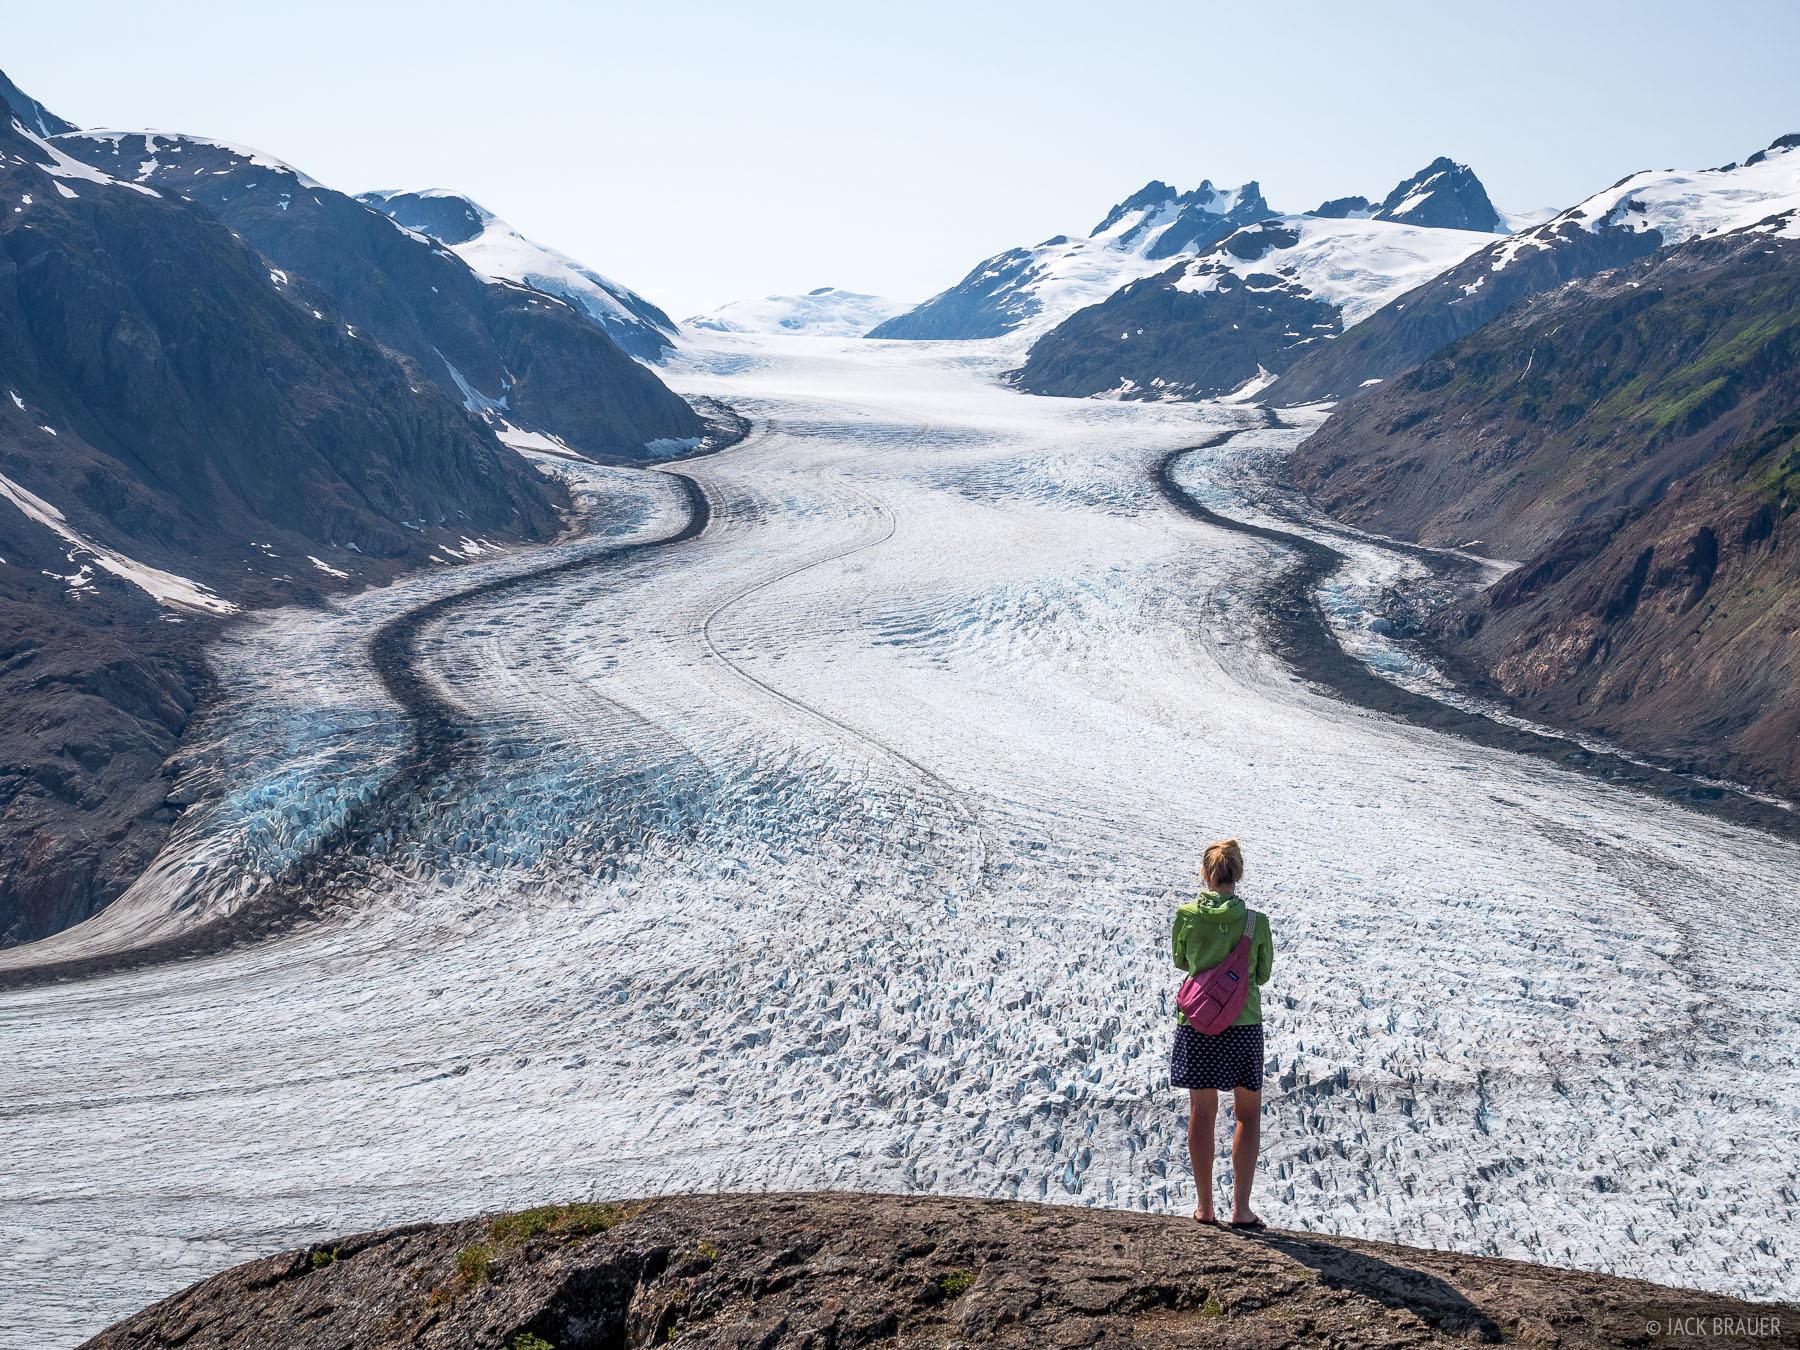 Alaska, Hyder, Salmon Glacier, photo